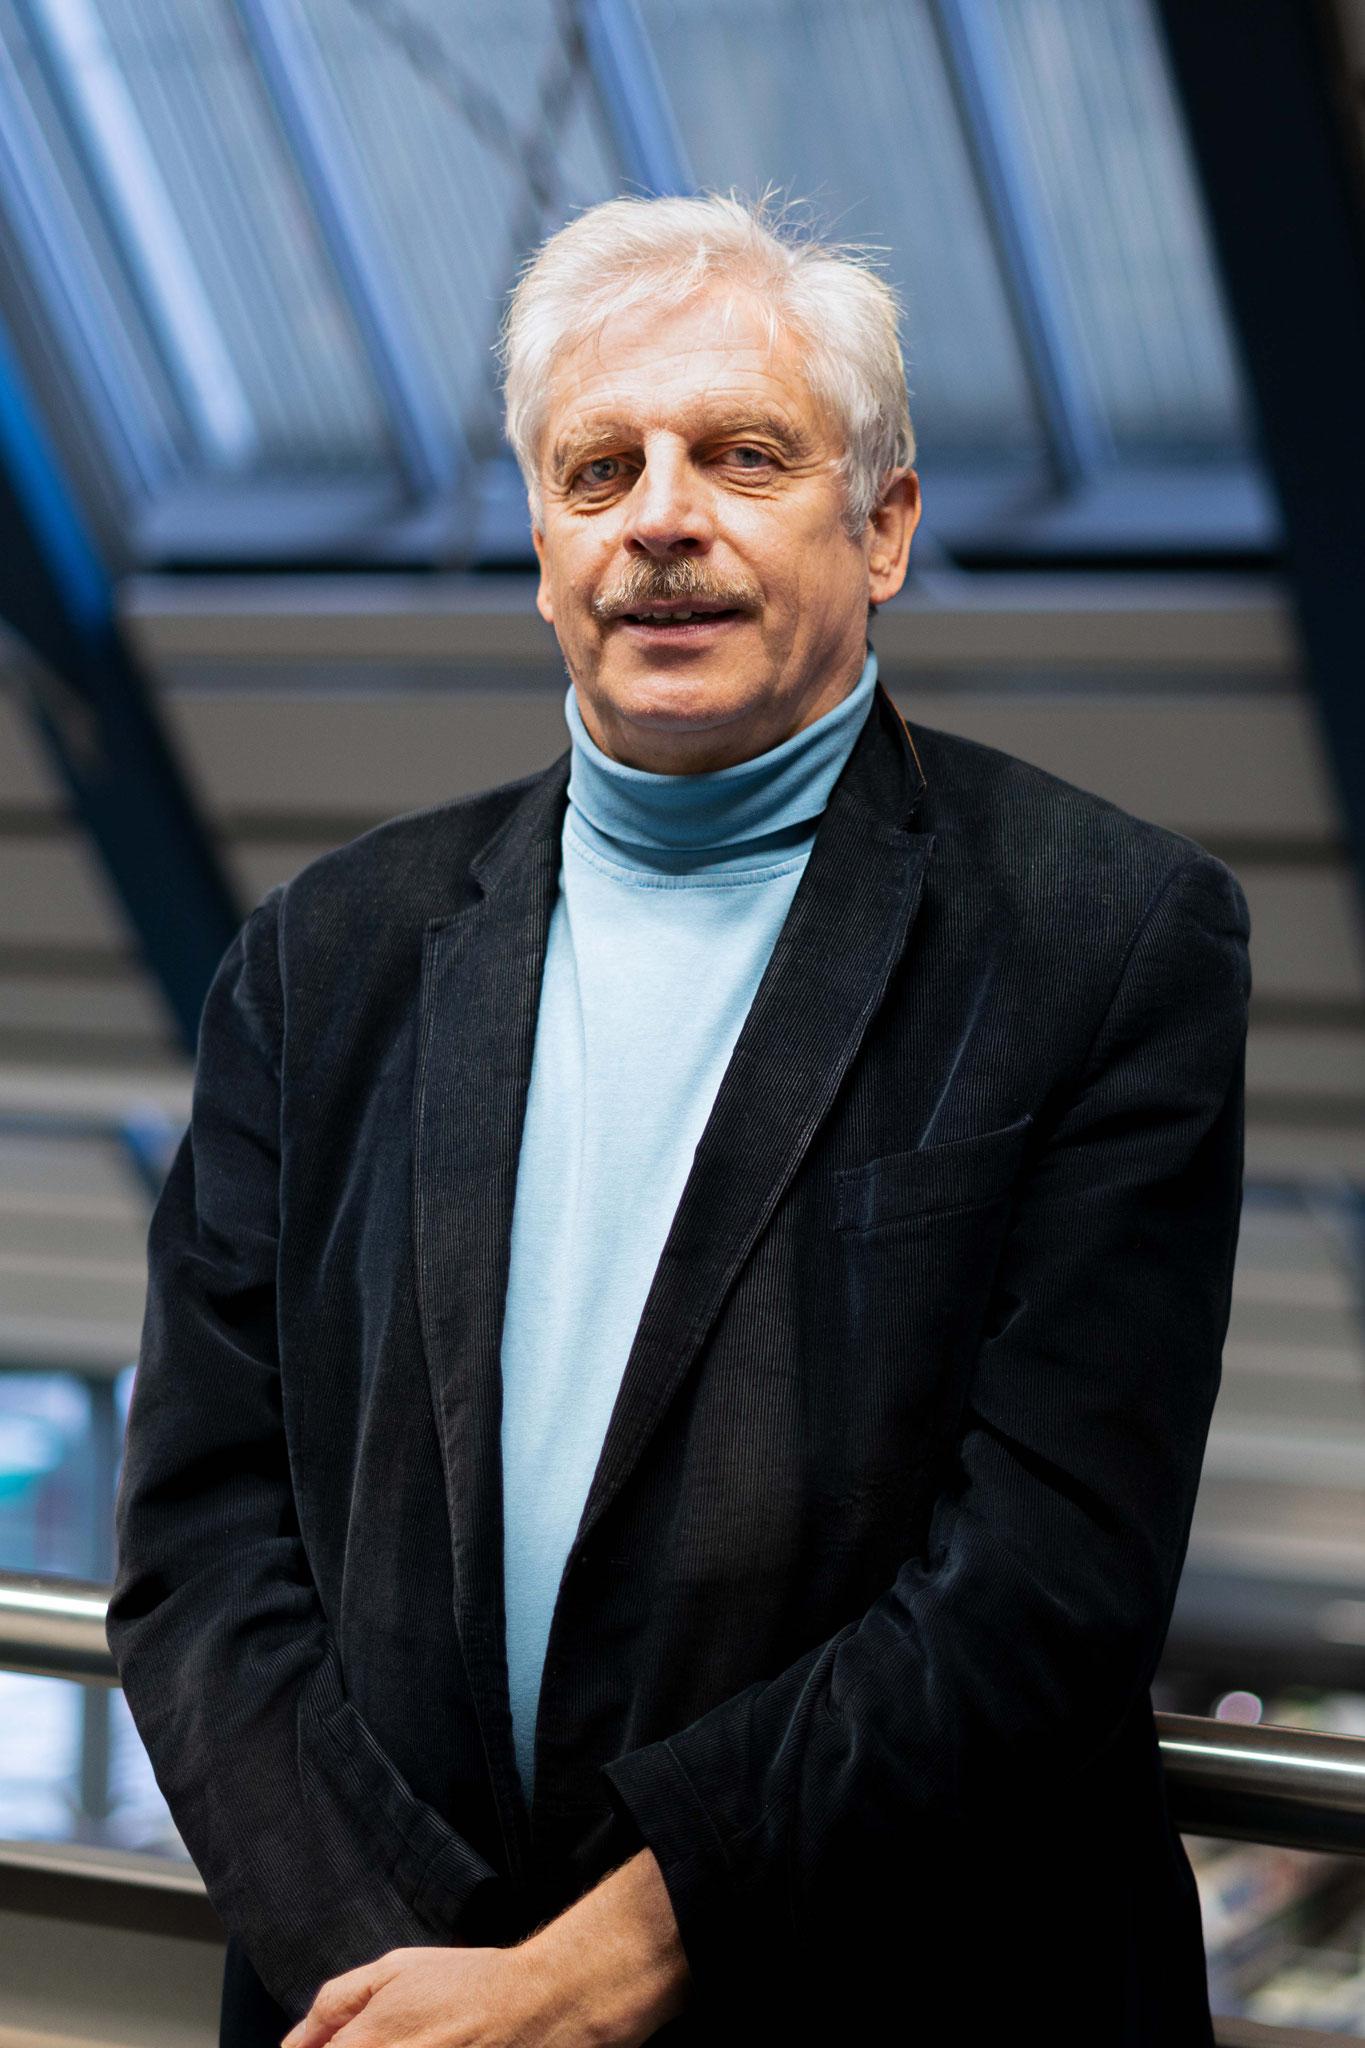 Uwe Bader